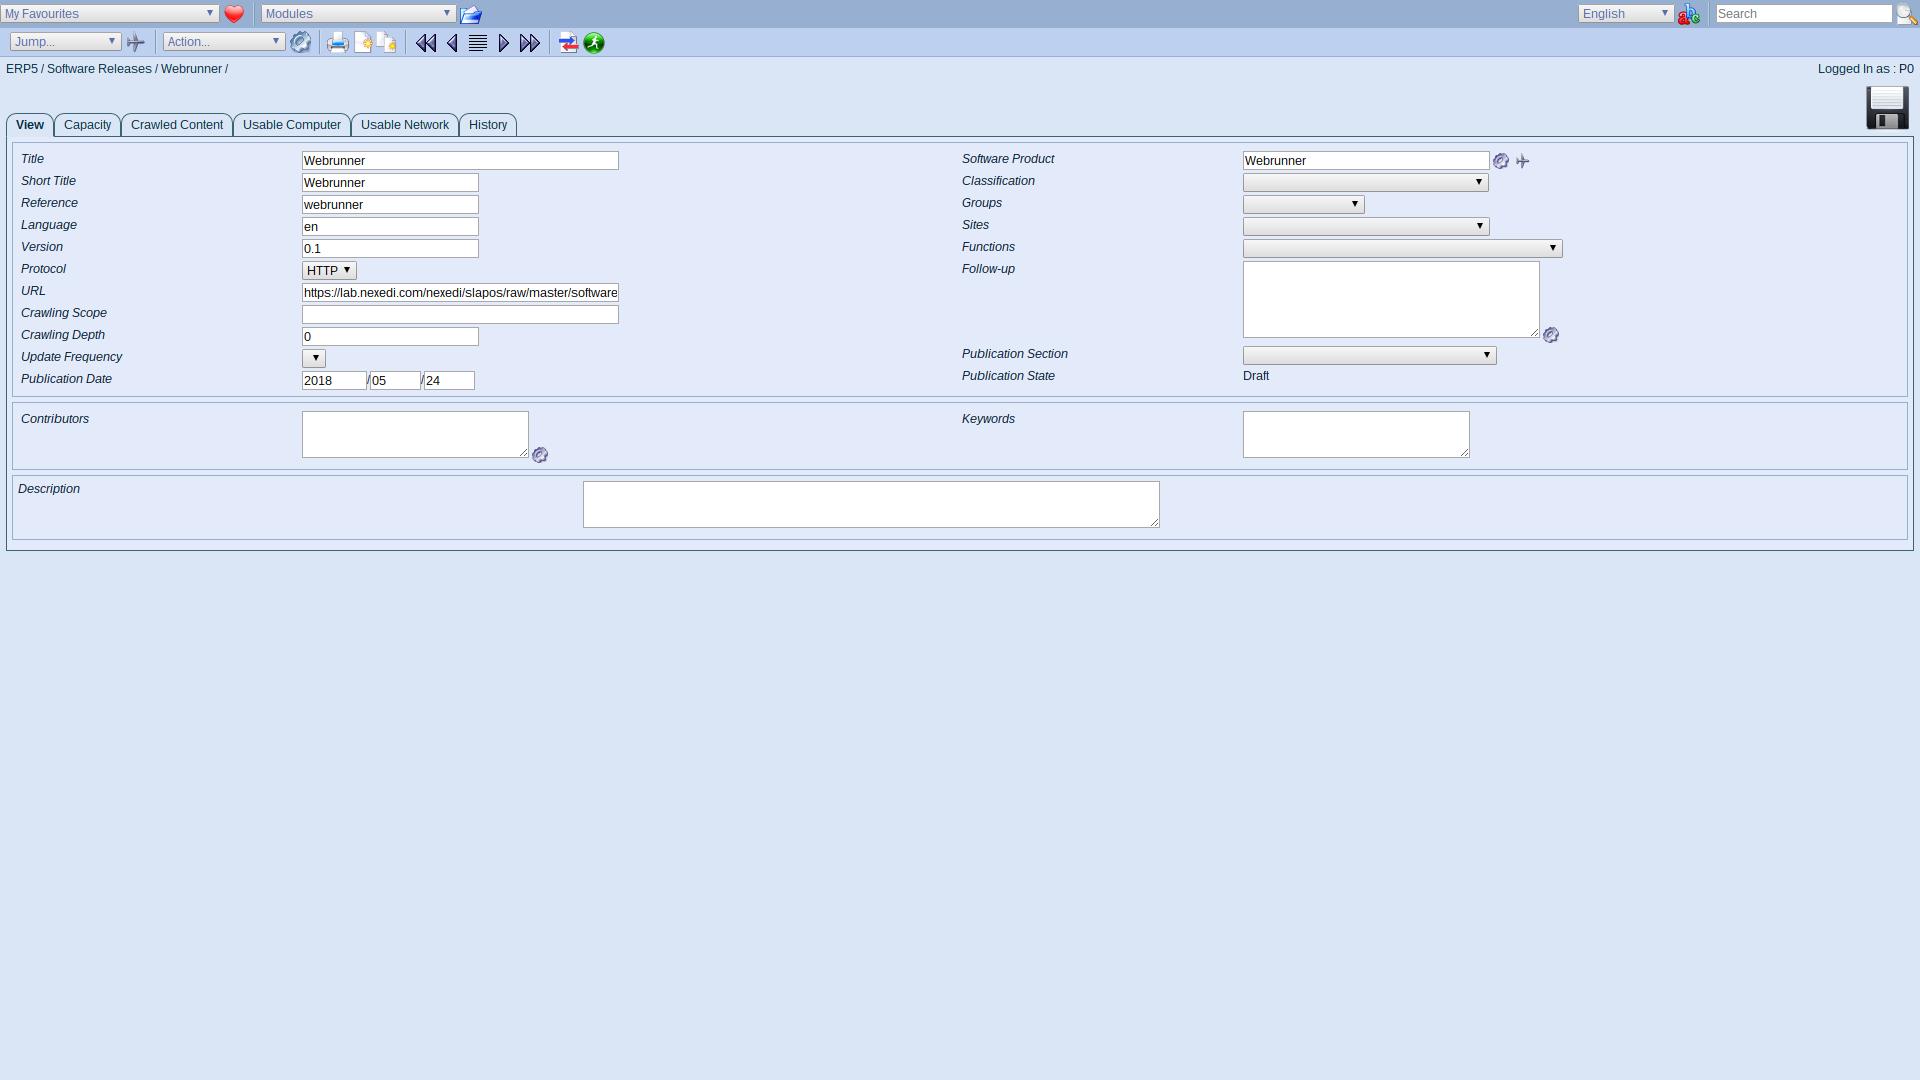 ERP5 Interface - Administrator Define Software Release Webrunner